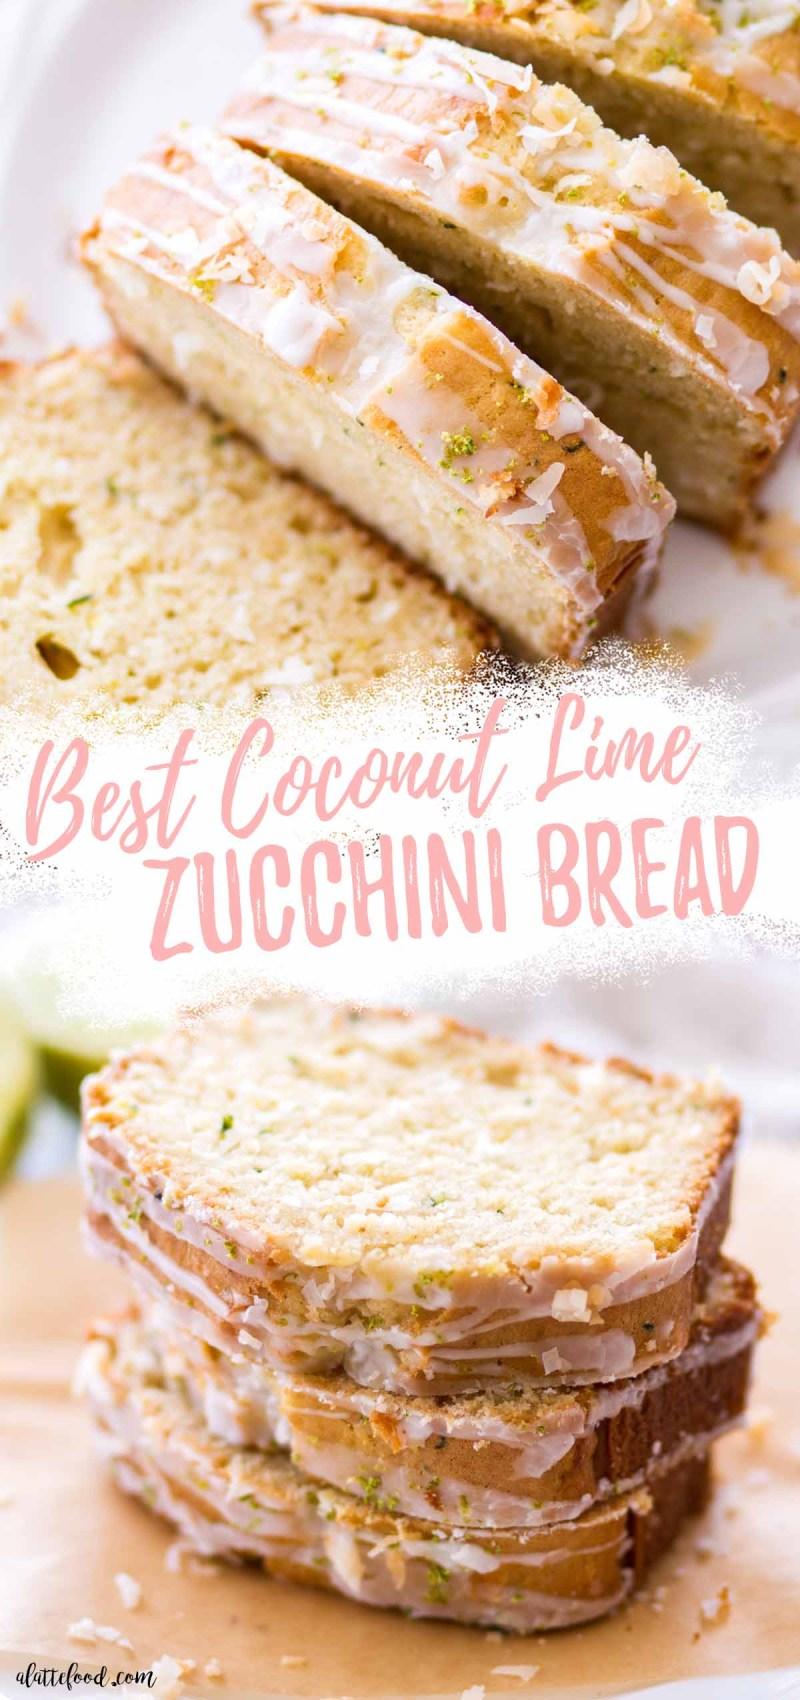 moist coconut lime zucchini bread slices collage